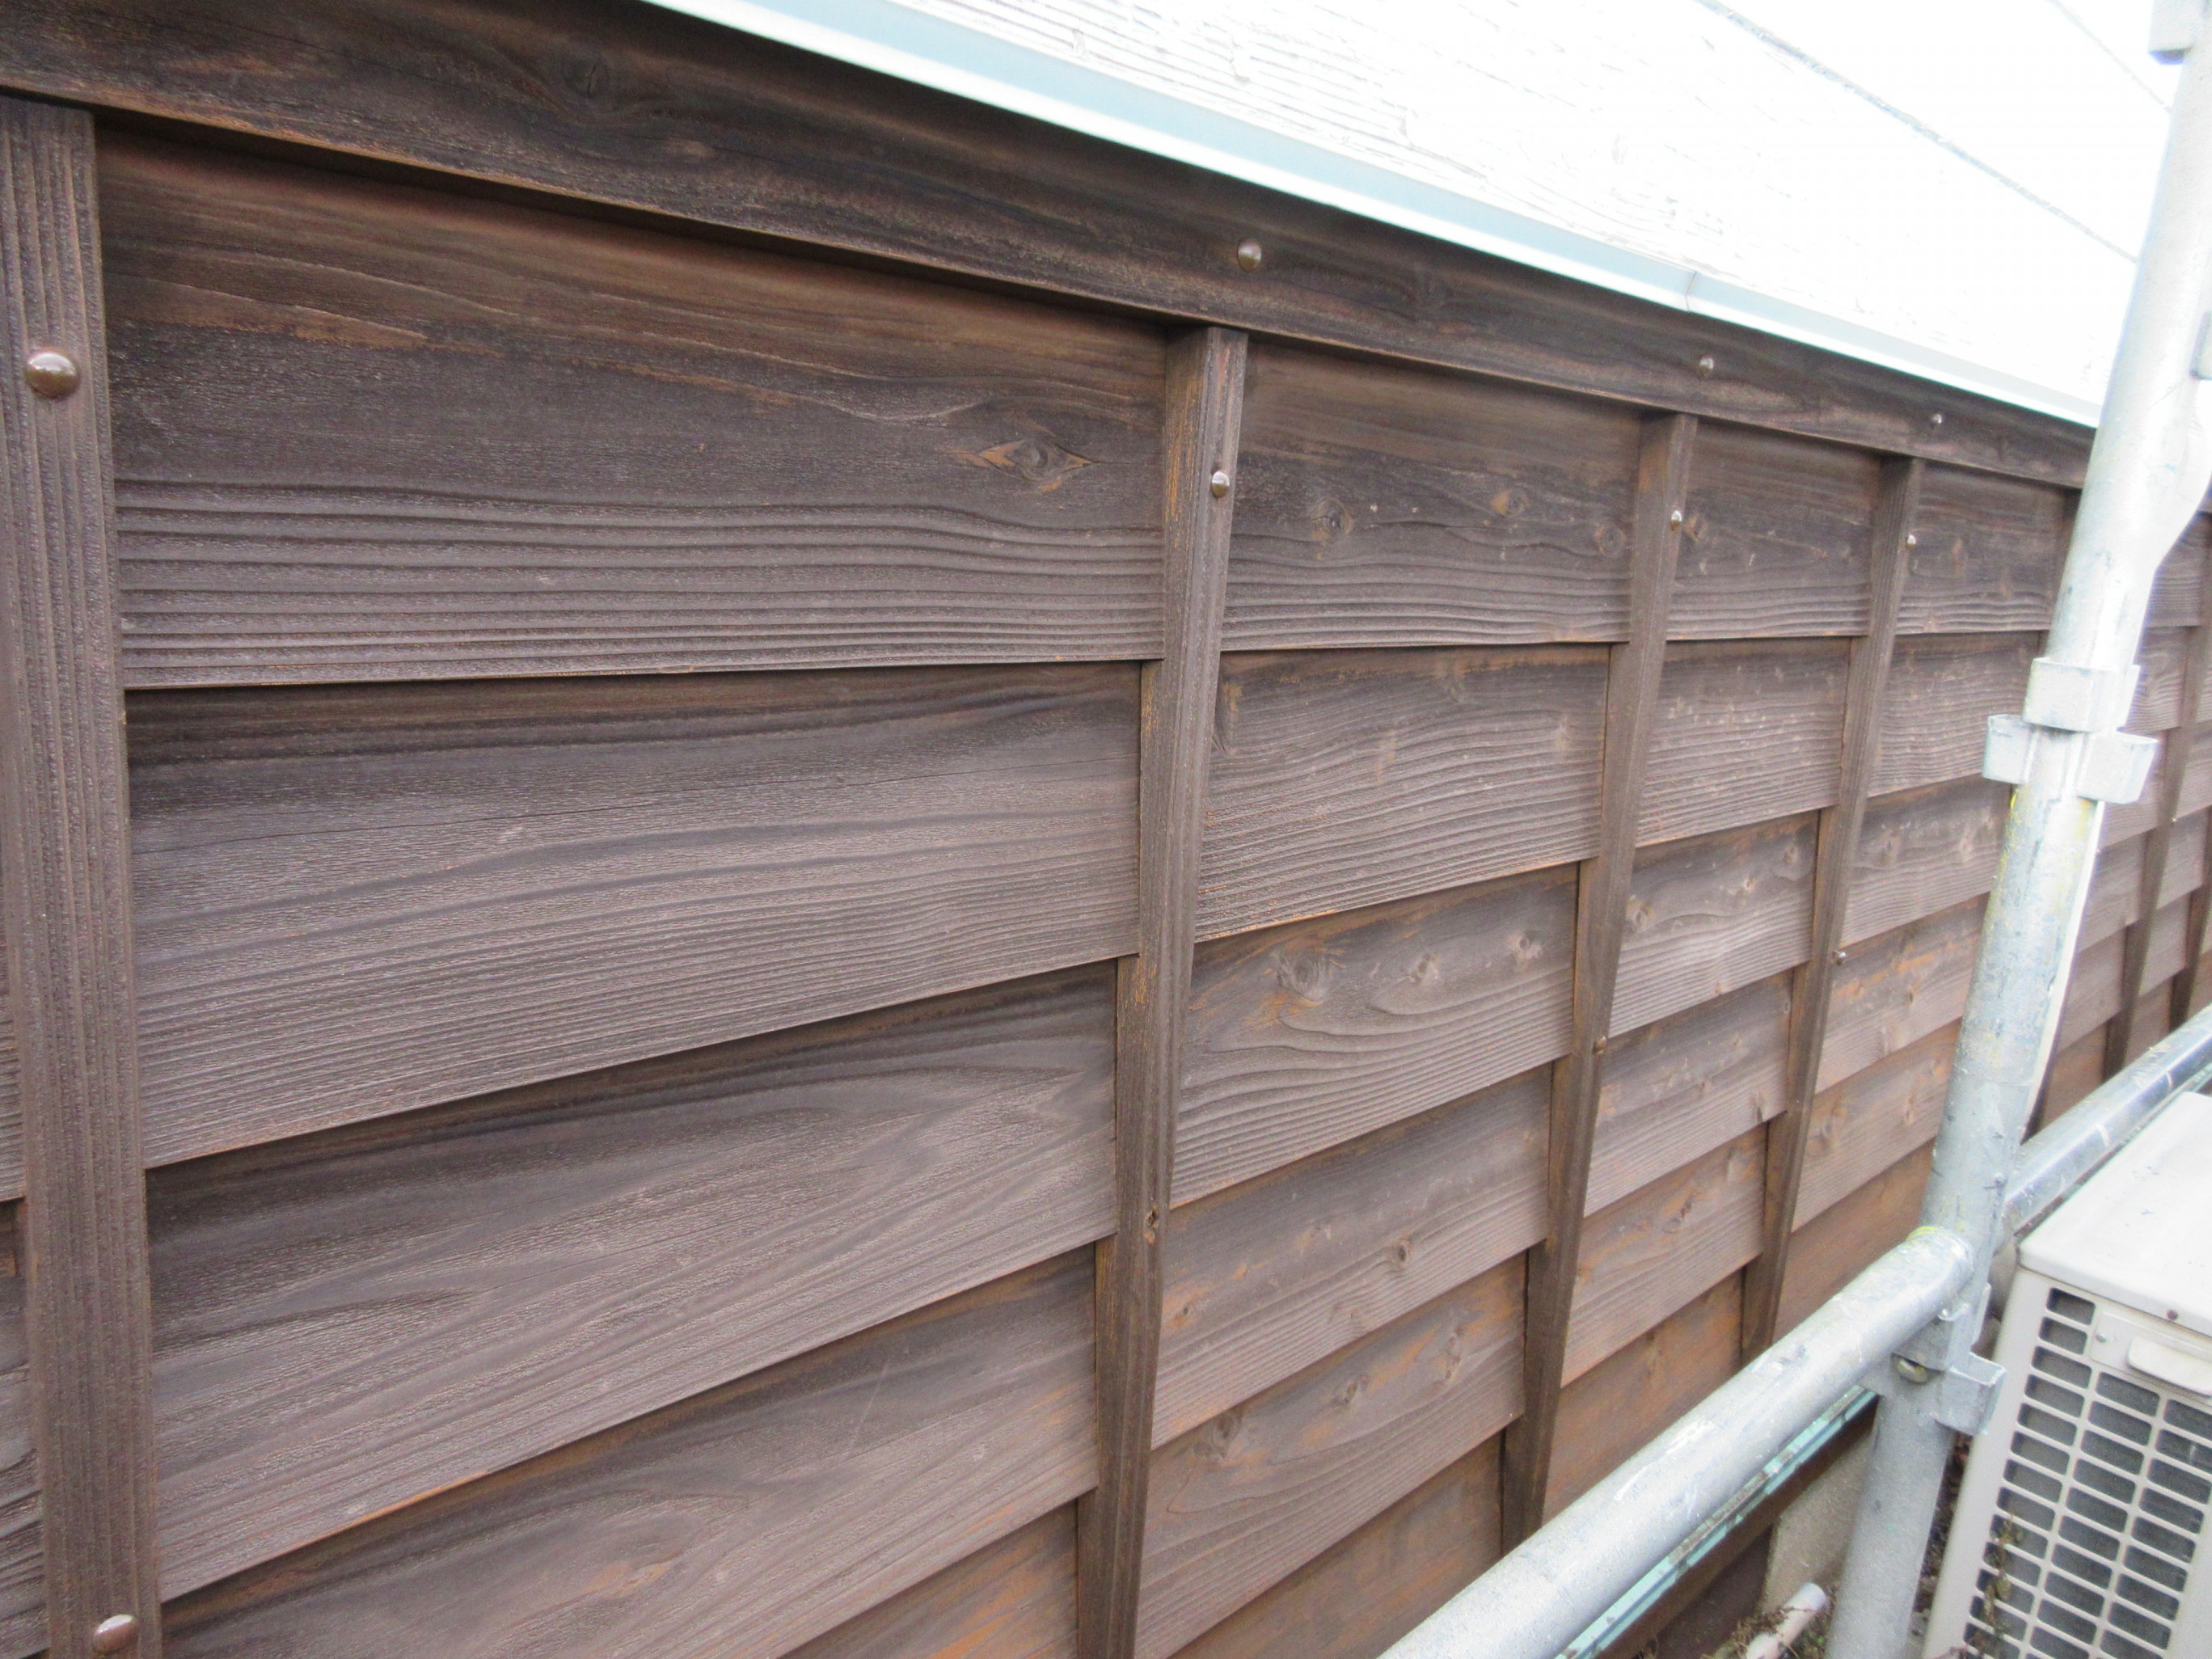 萩市F様邸外壁カバー工法及び塗装工事